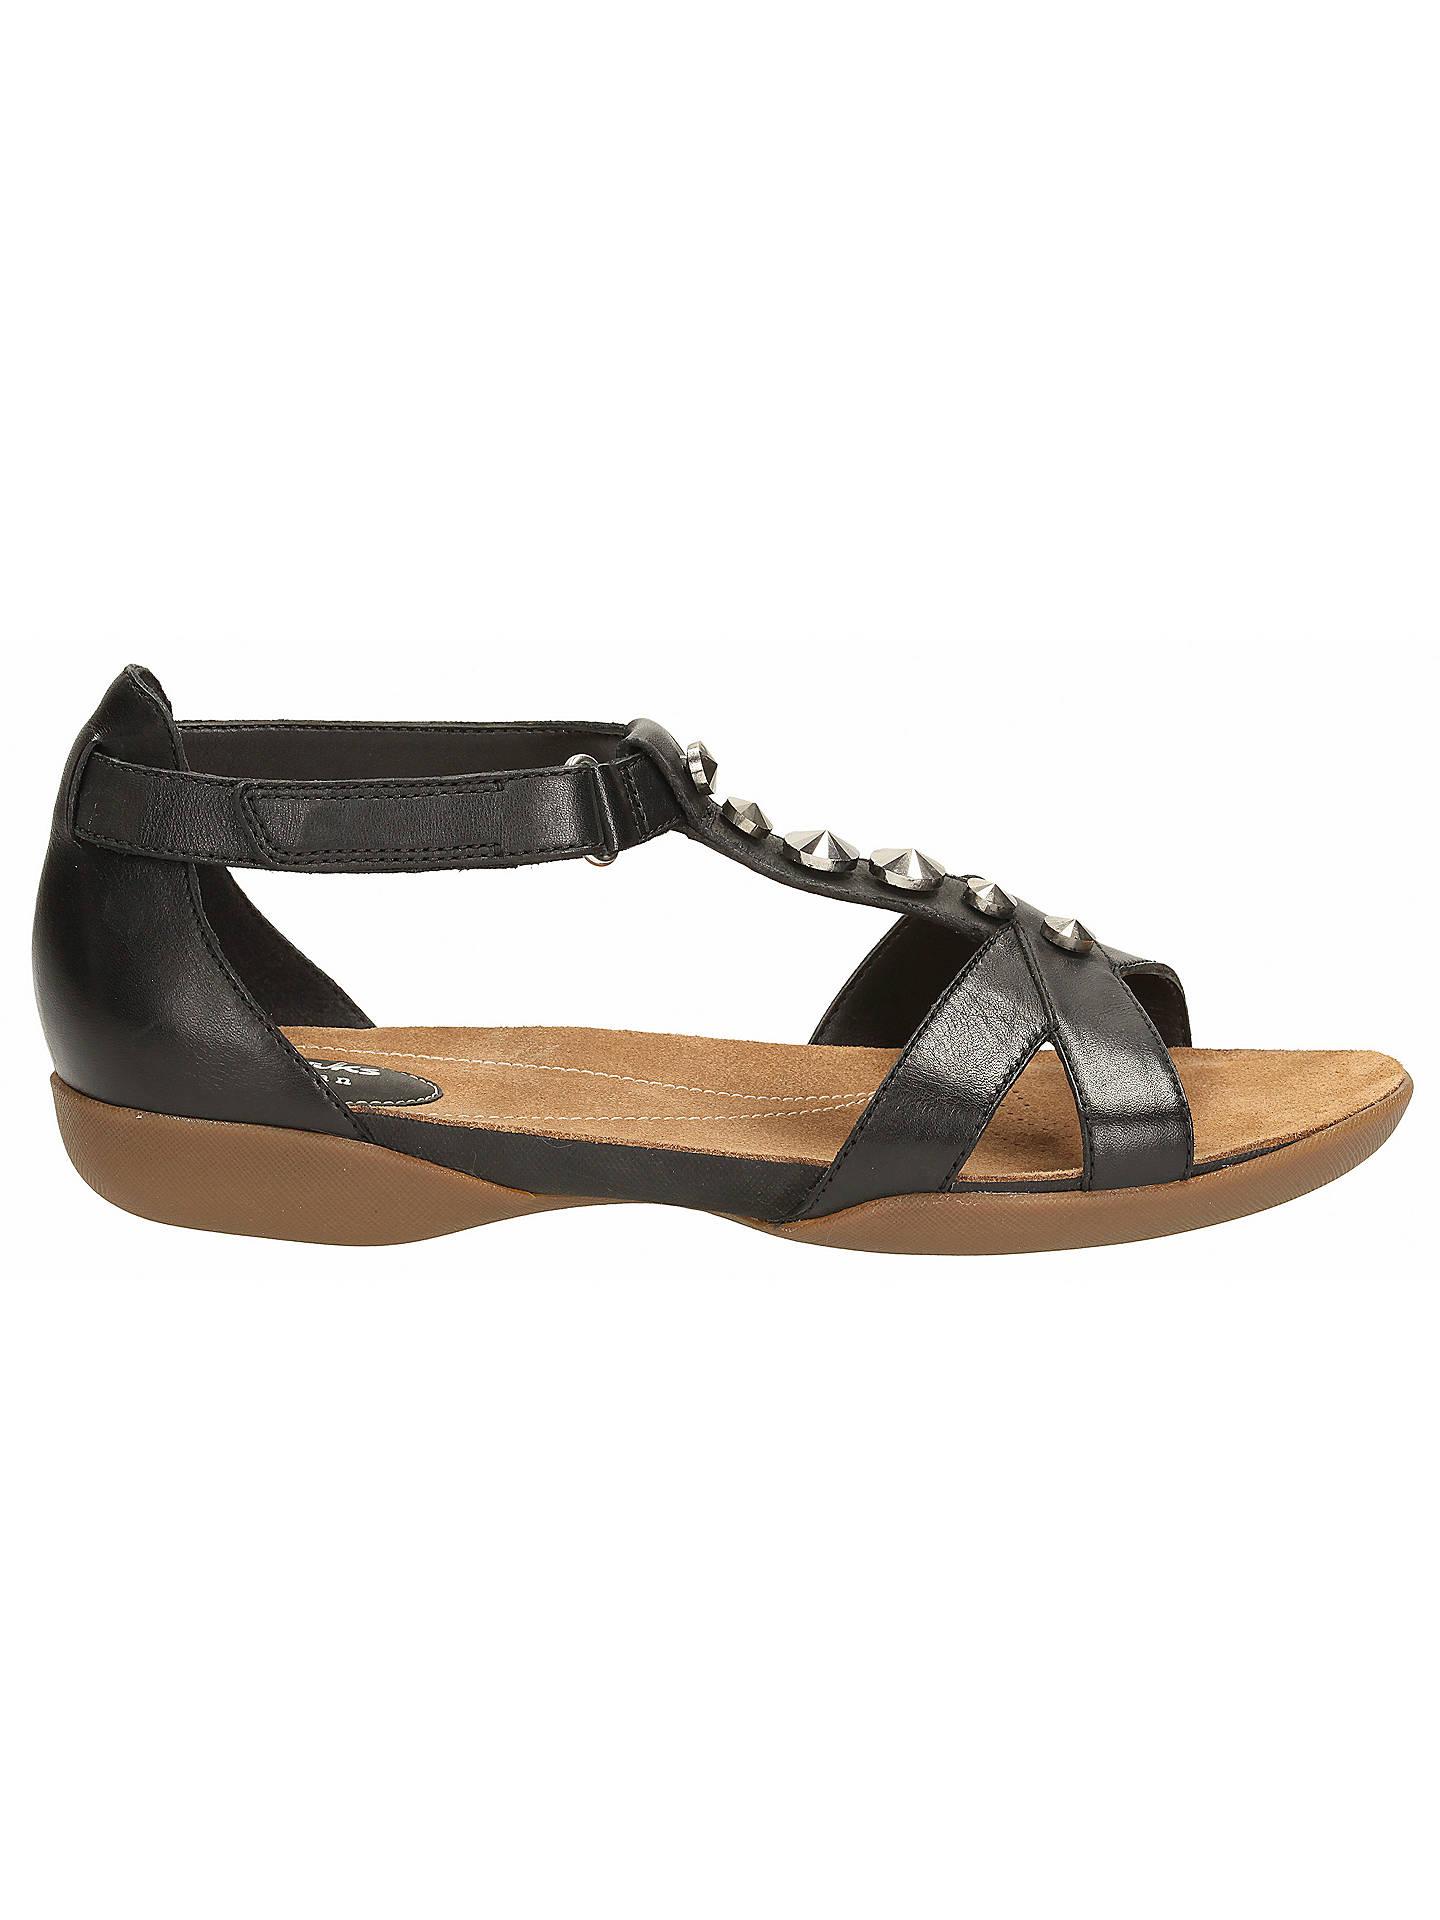 913039562 Clarks Raffi Scent Leather Sandals at John Lewis   Partners